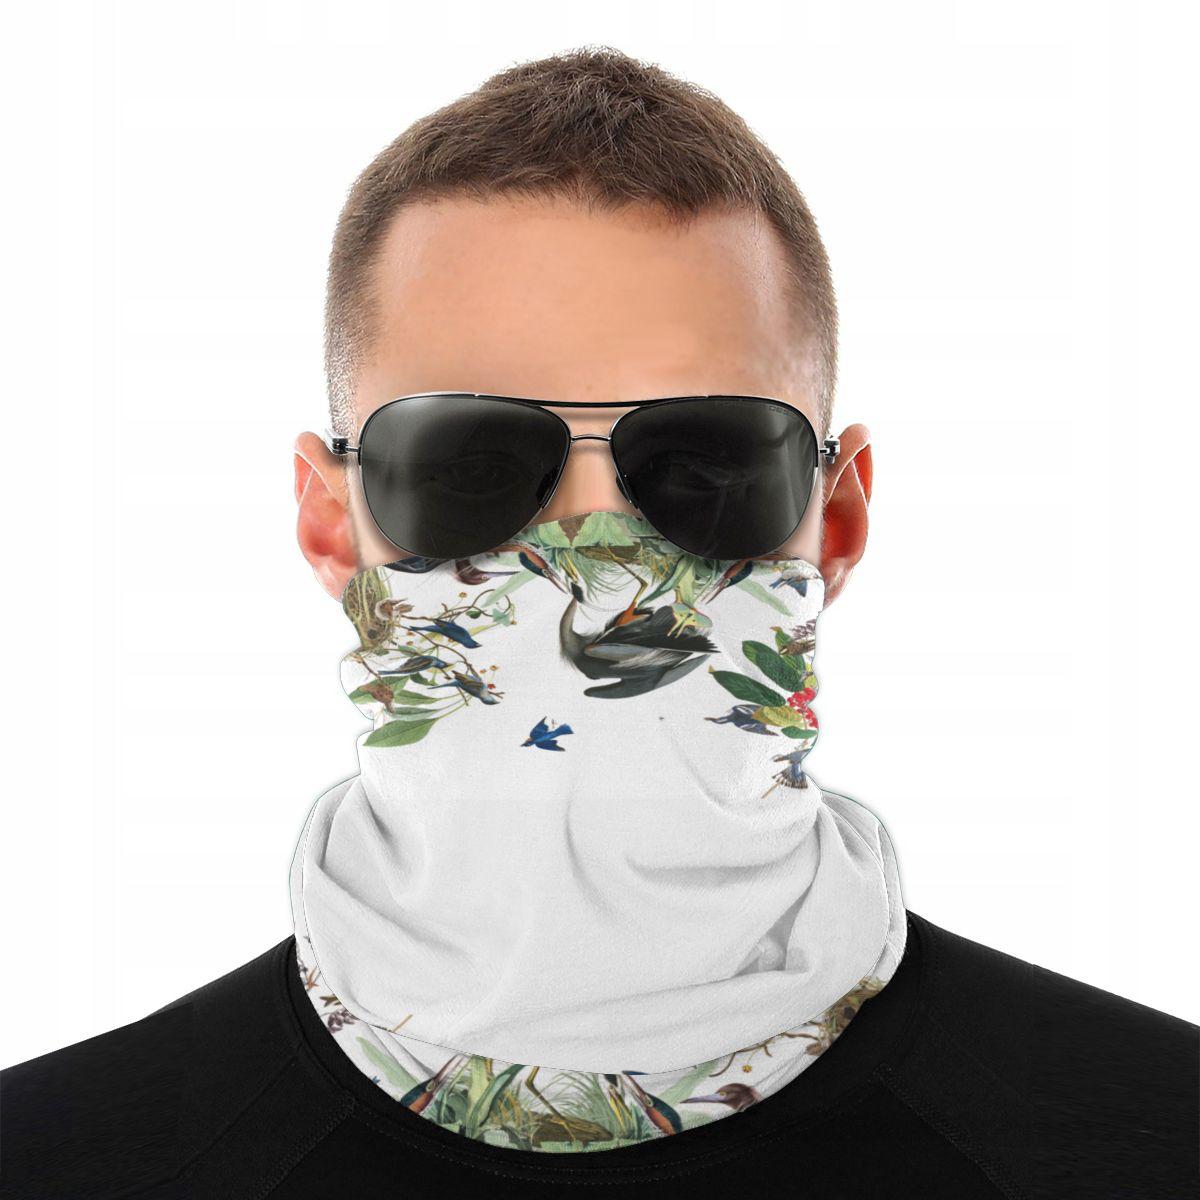 Audubon Herons Loon Bluebird Birds Scarves Neck Face Mask Neck Gaiter Wildlife Balaclava Bandana Polyester Headwear Outdoor Hike